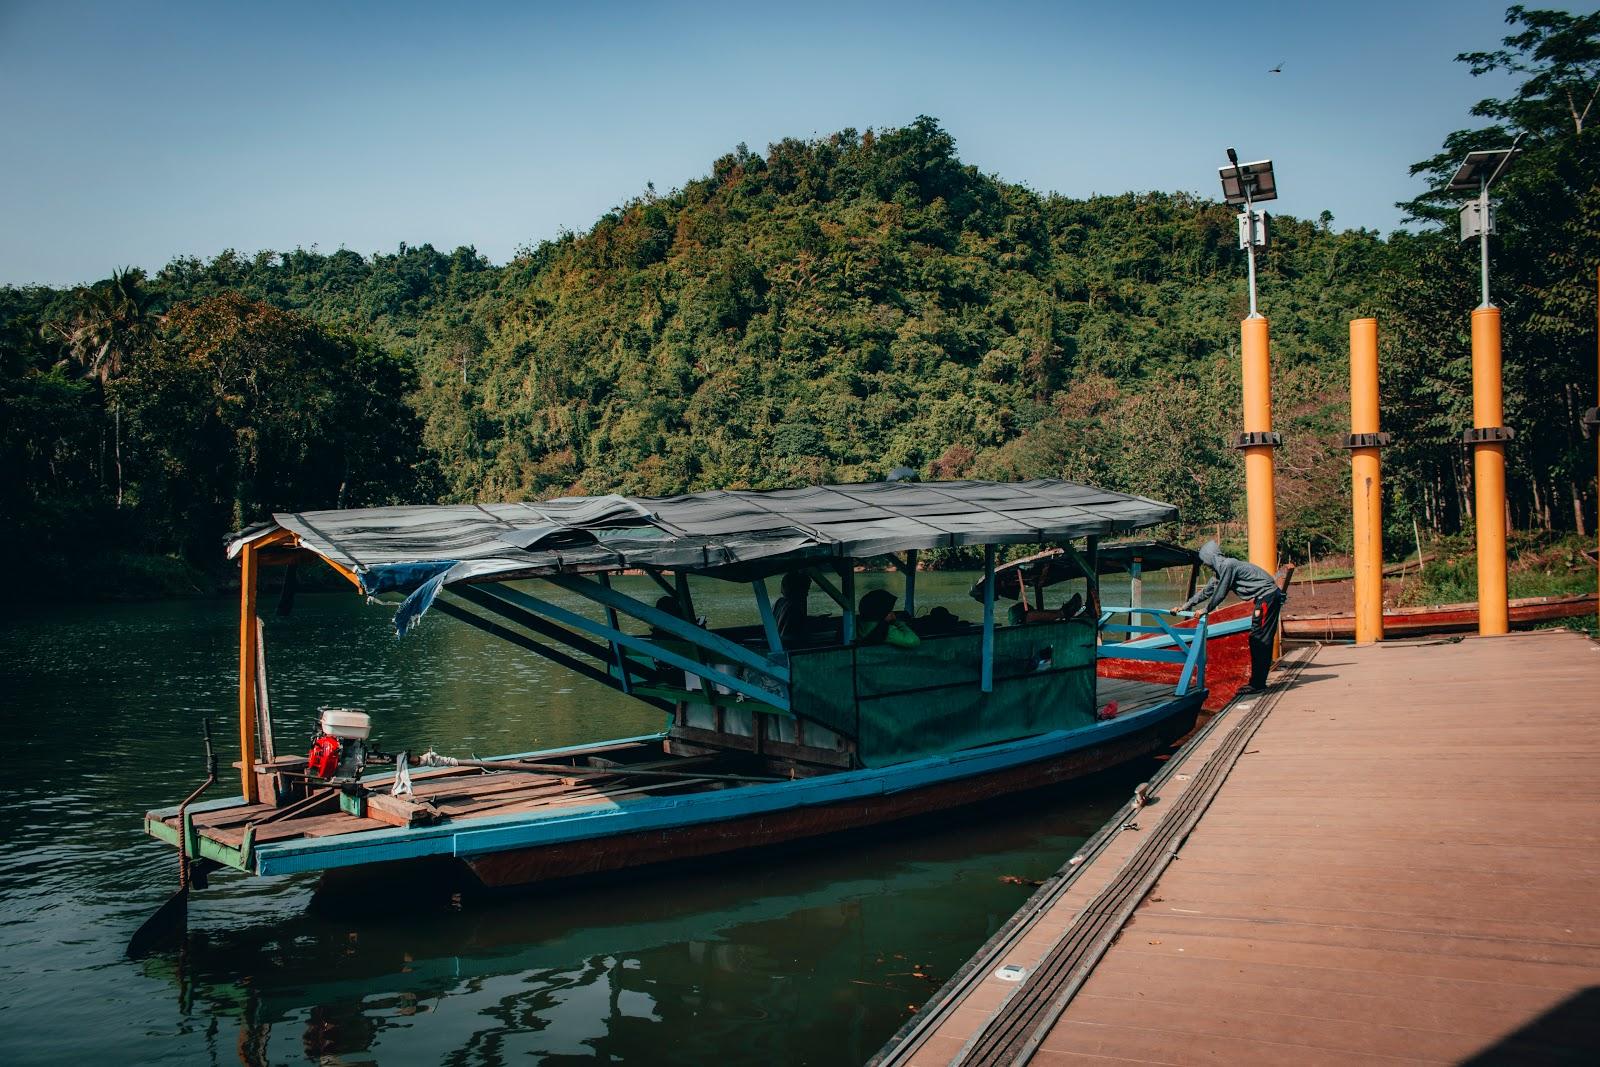 Cikaso Fun River - Menelusuri Sungai Cikaso - Jampang Sukabumi ...